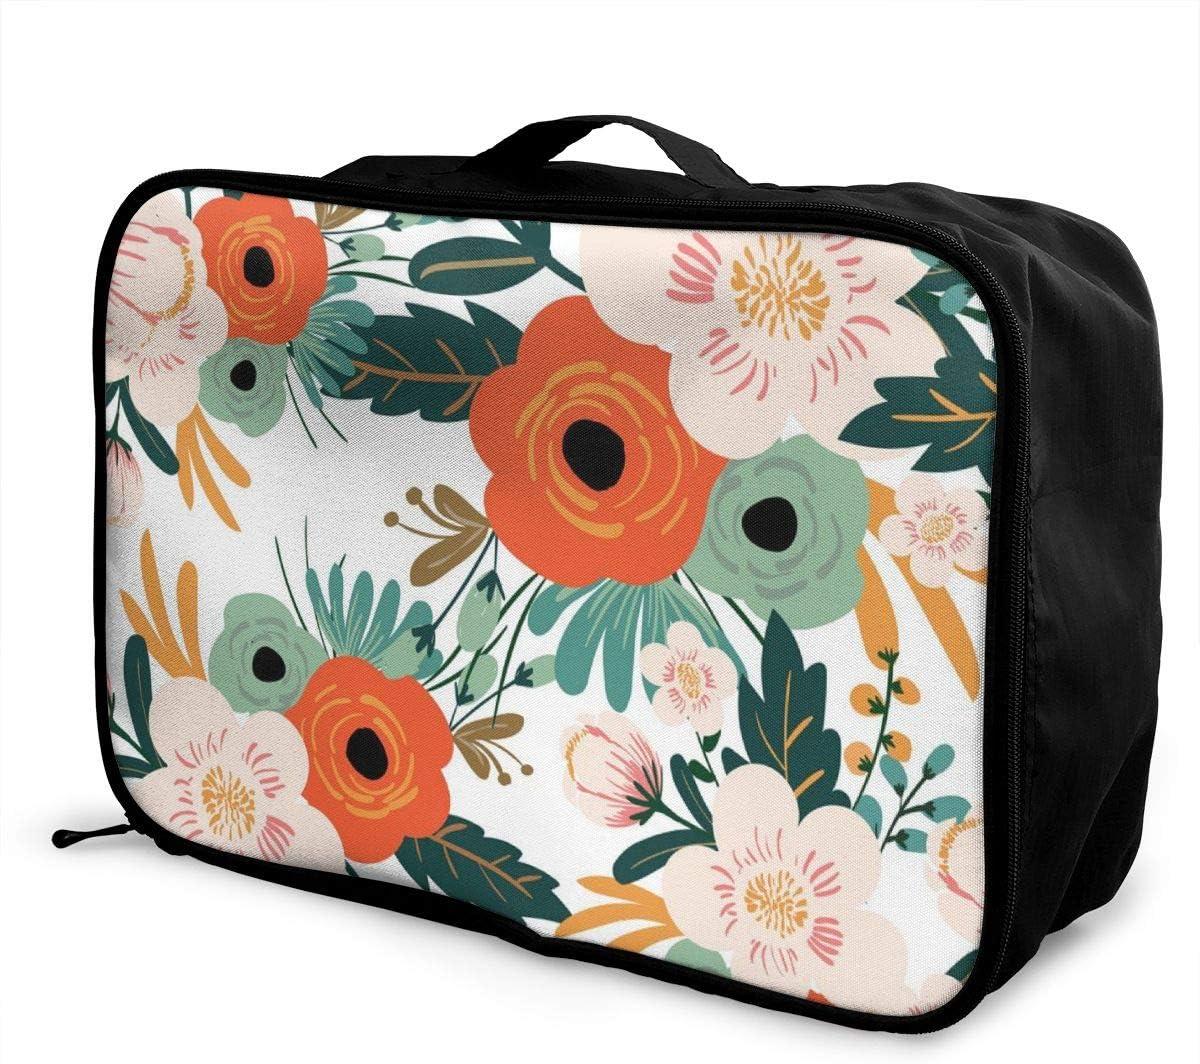 Yunshm Flower Seamless Pattern Vintage Style Vector Image Customized Trolley Handbag Waterproof Unisex Large Capacity For Business Travel Storage